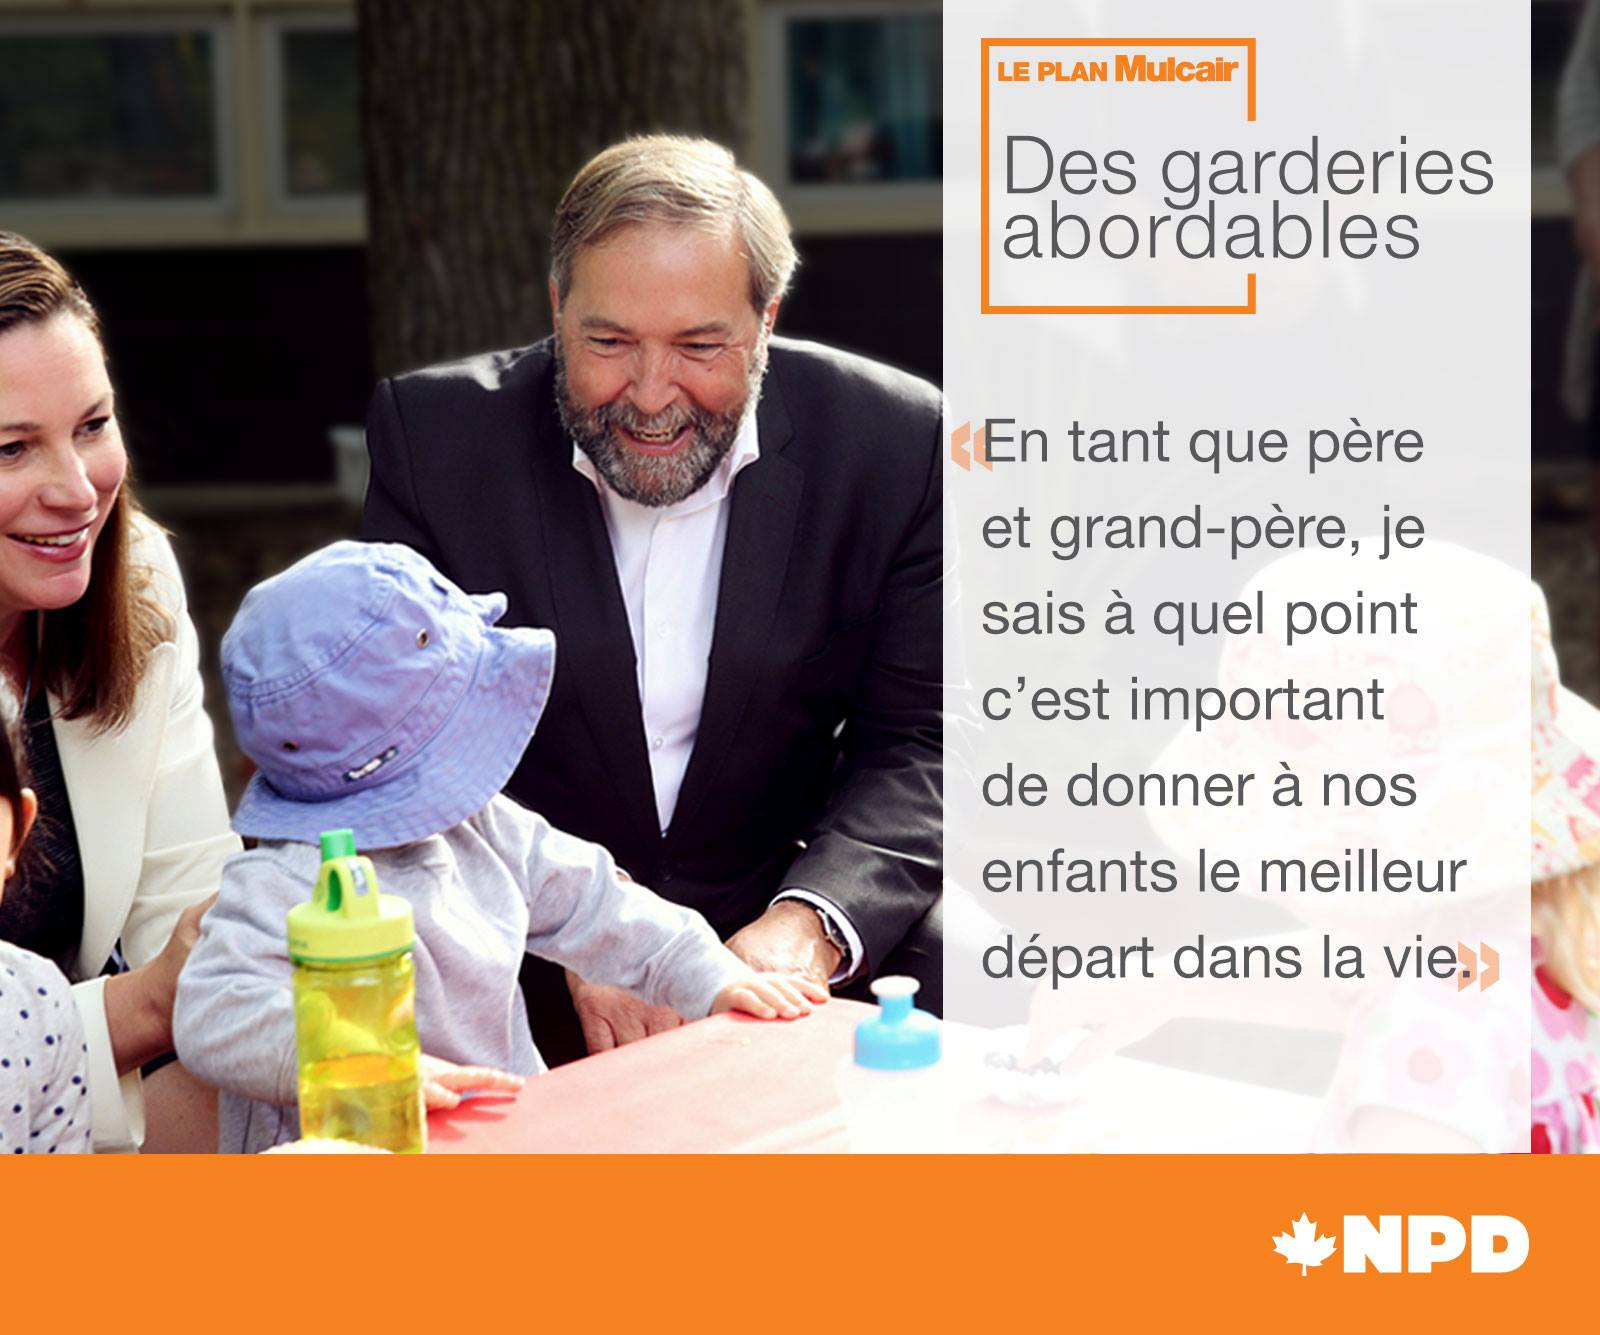 Garderie_abordable.jpg